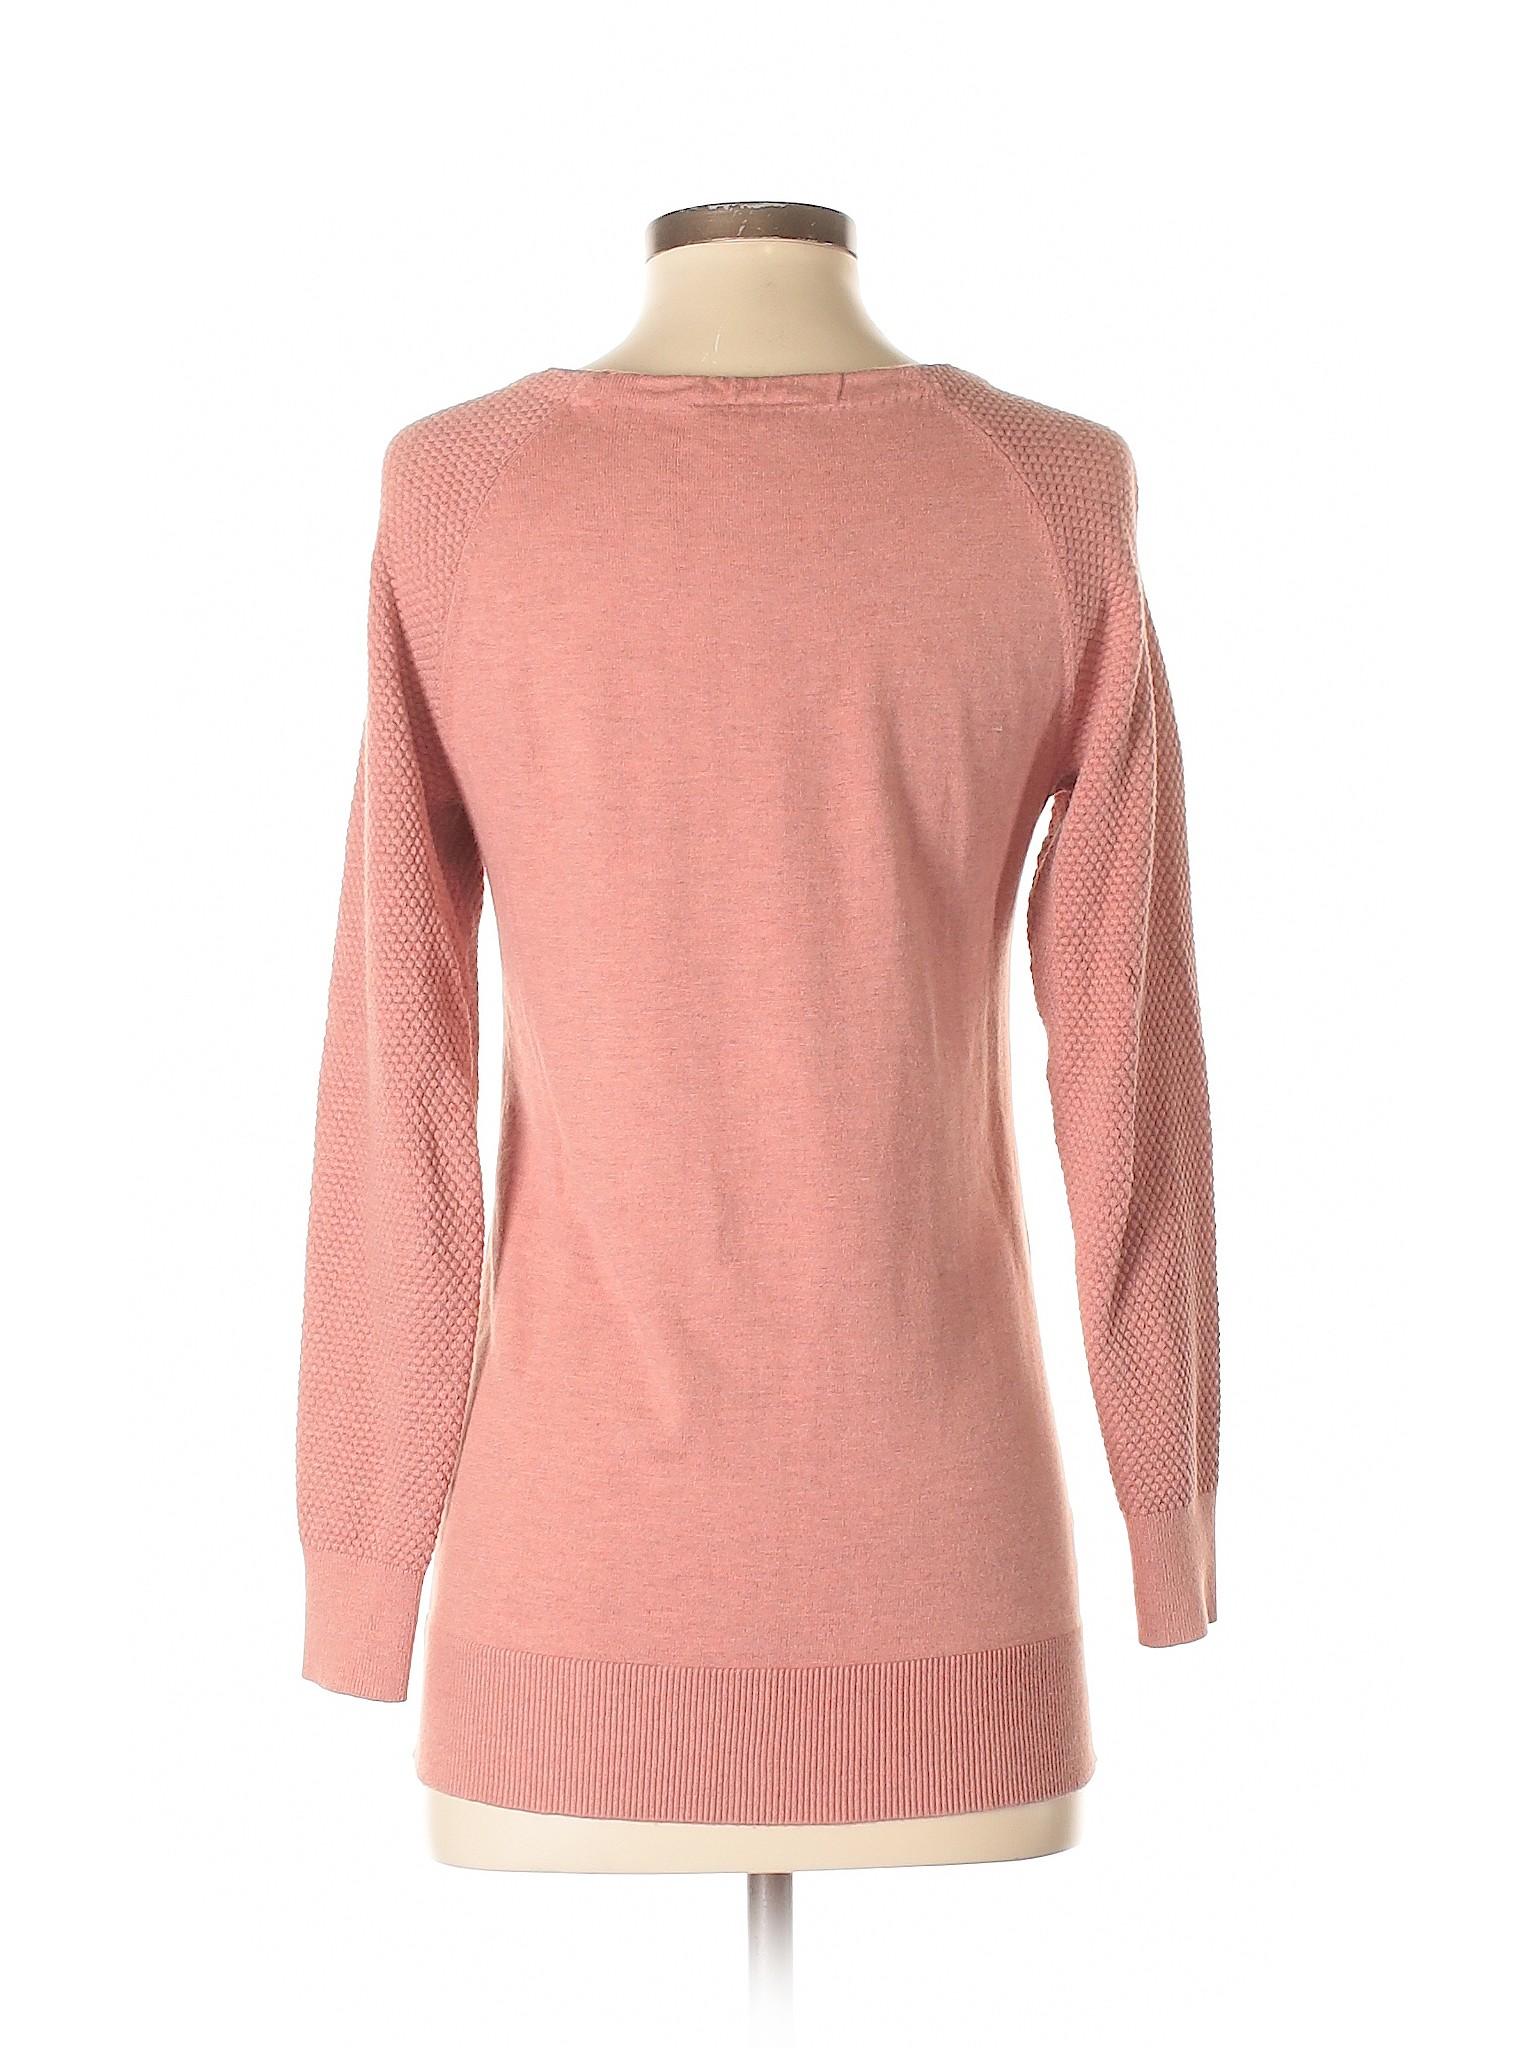 Pullover LOFT Boutique Sweater Taylor Outlet winter Ann 8qqzw4B